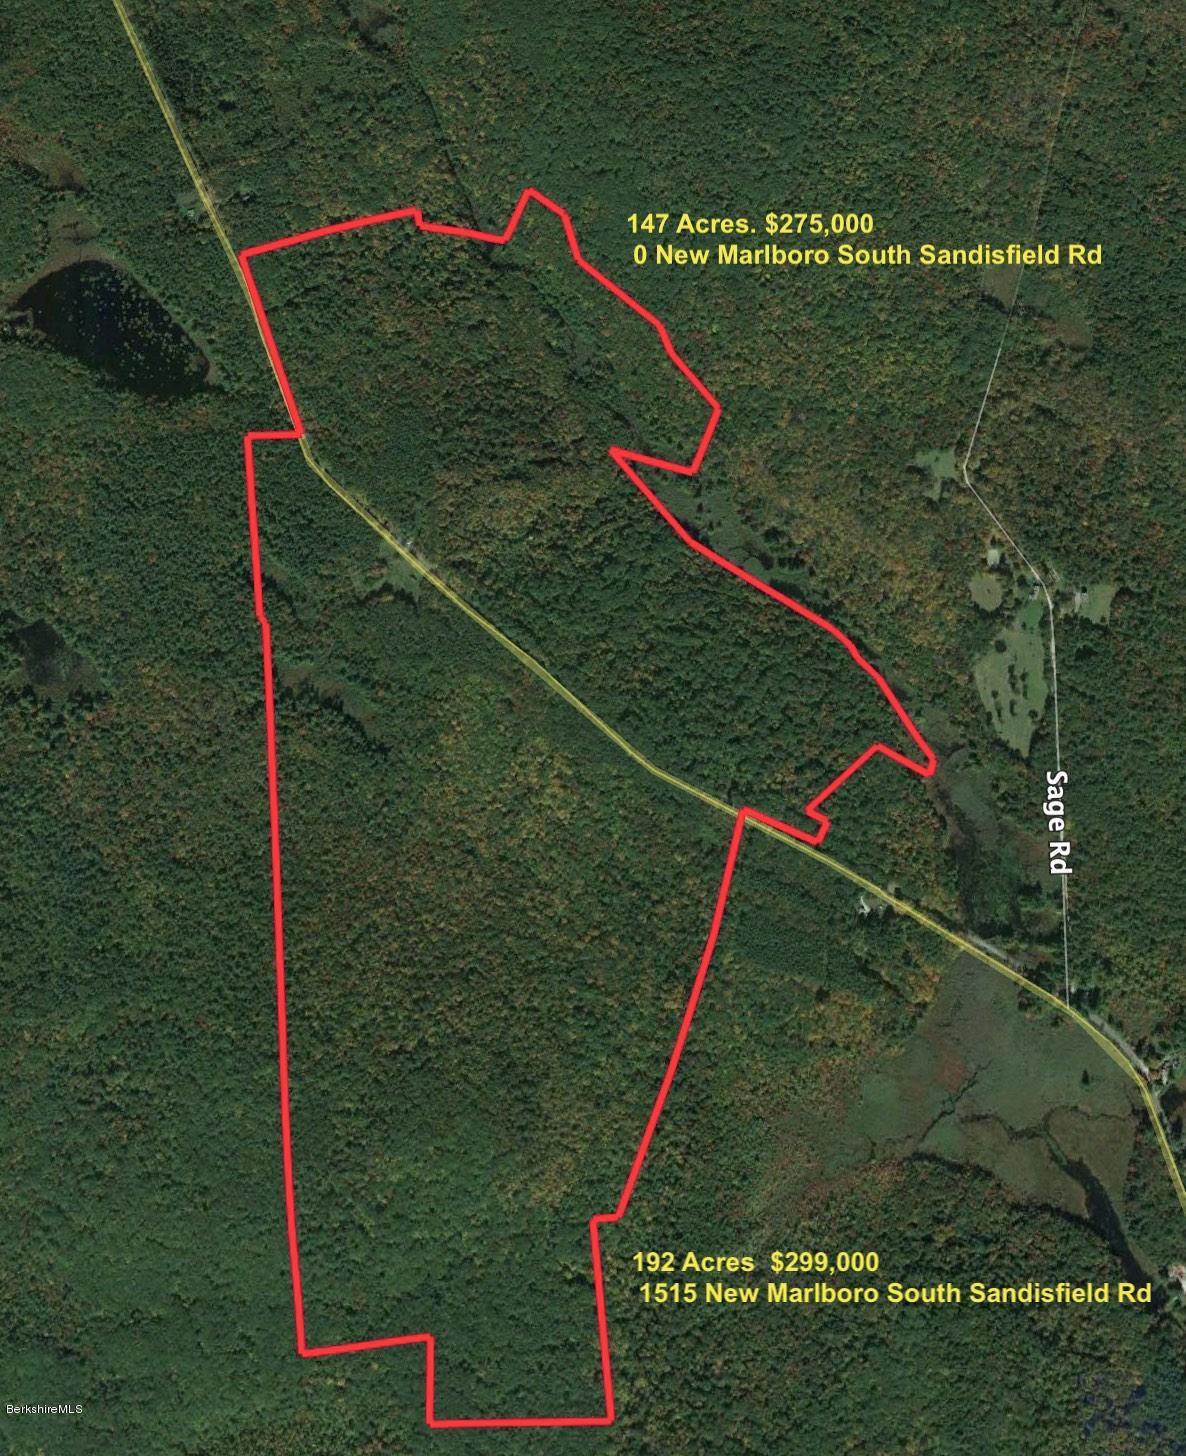 1515 New Marlboro South Sandisfield New Marlborough MA 01230